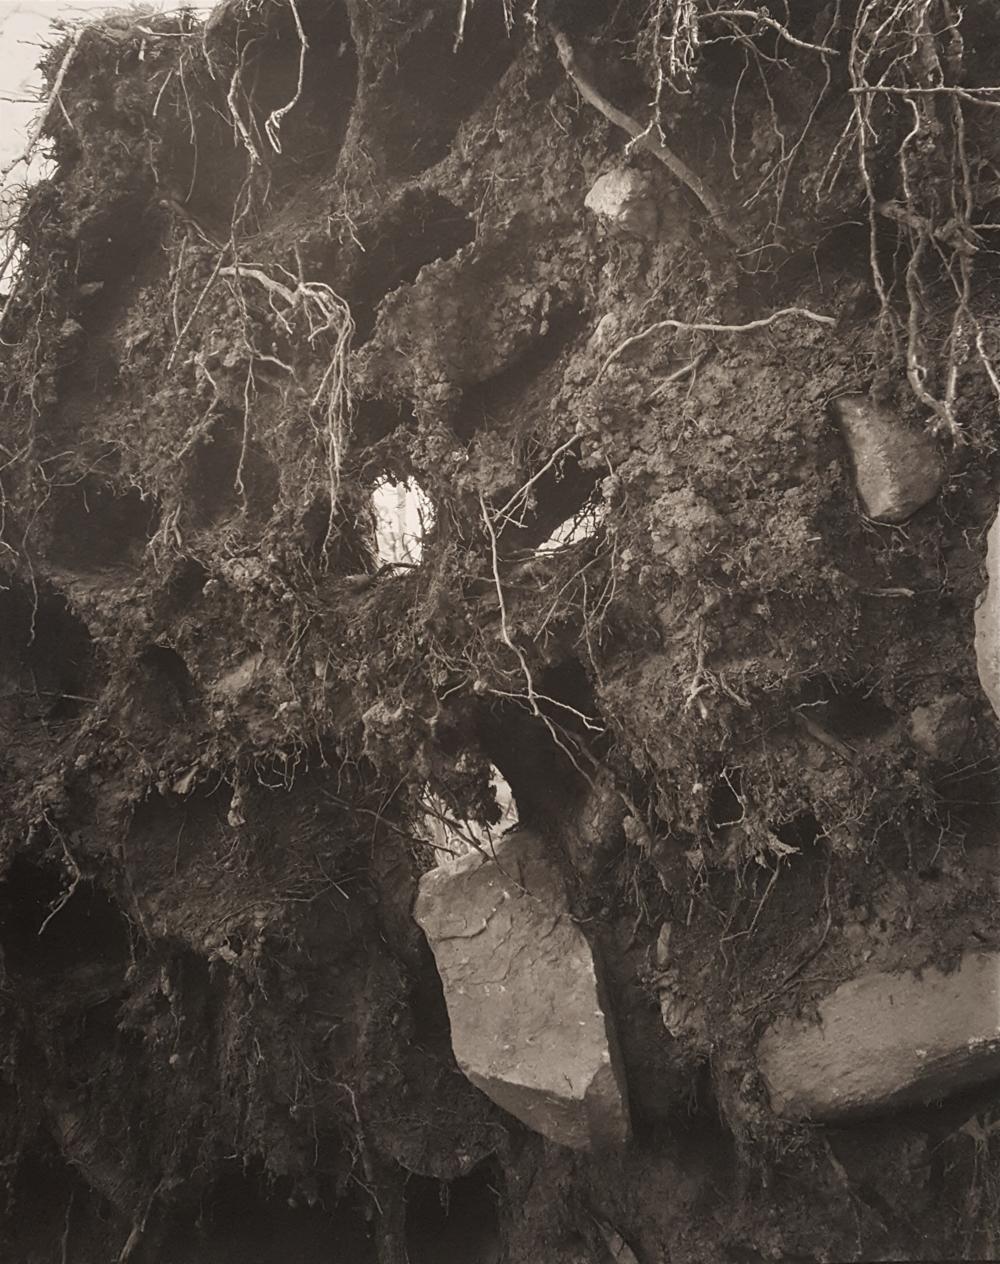 JOHN YANG,  Long Pond Preserve ,  Waccabuc, New York,  1980